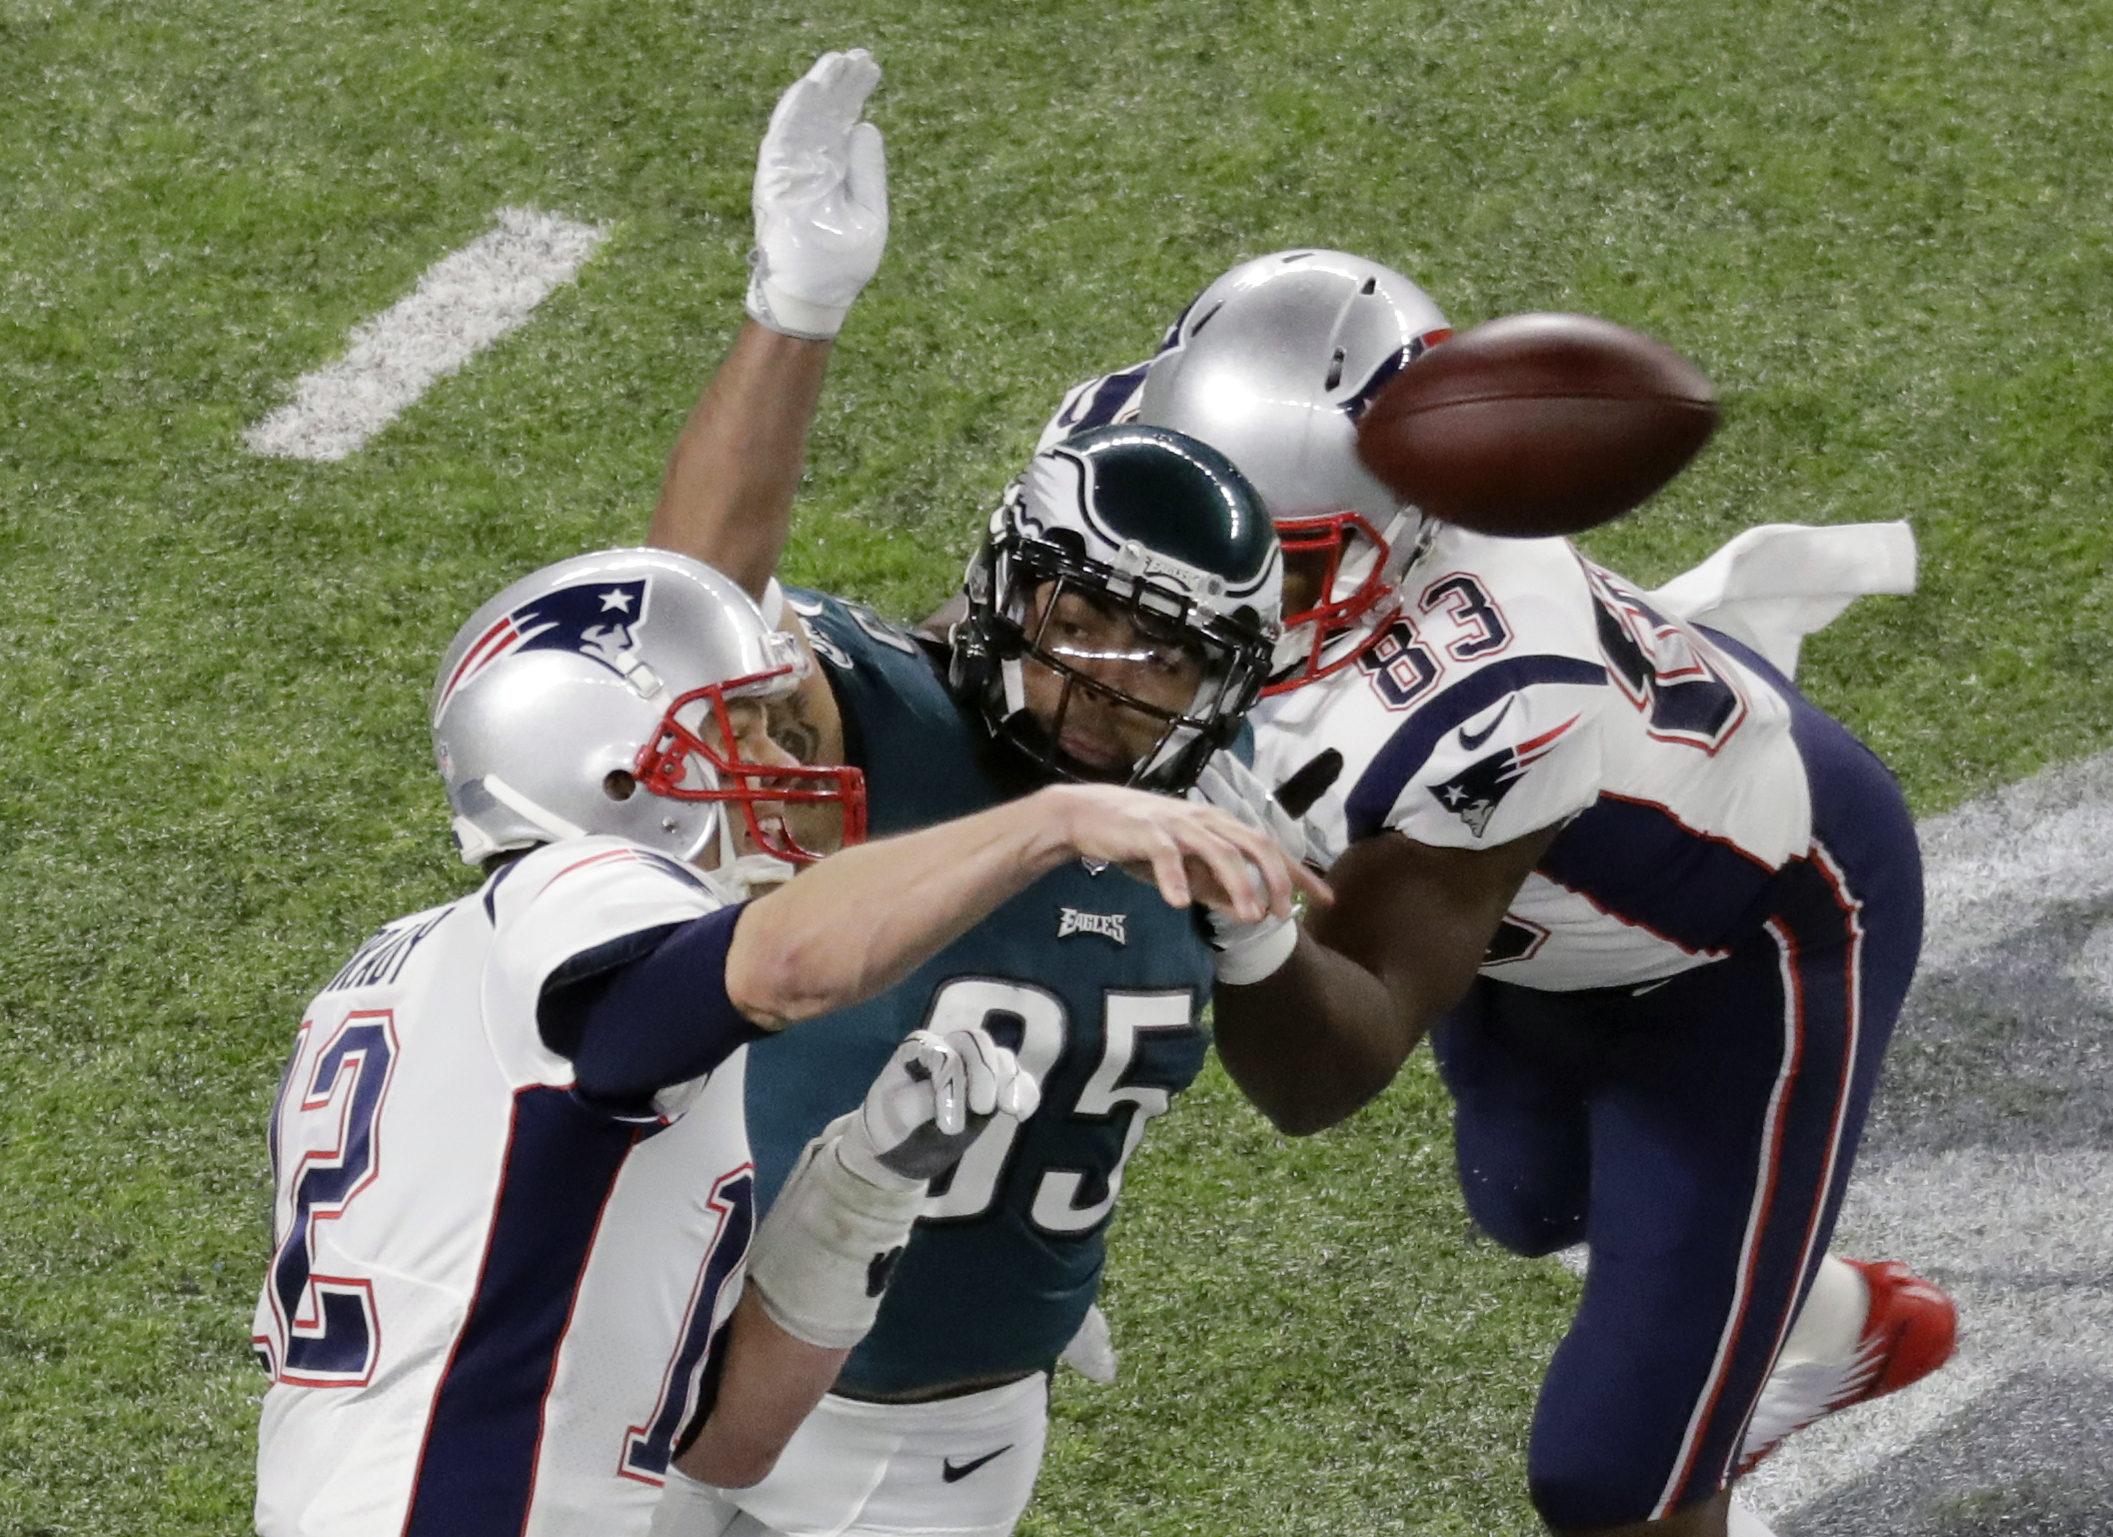 "<div class=""meta image-caption""><div class=""origin-logo origin-image ap""><span>AP</span></div><span class=""caption-text"">New England Patriots quarterback Tom Brady, left, passes against the Philadelphia Eagles during the second half. (AP Photo/Eric Gay)</span></div>"